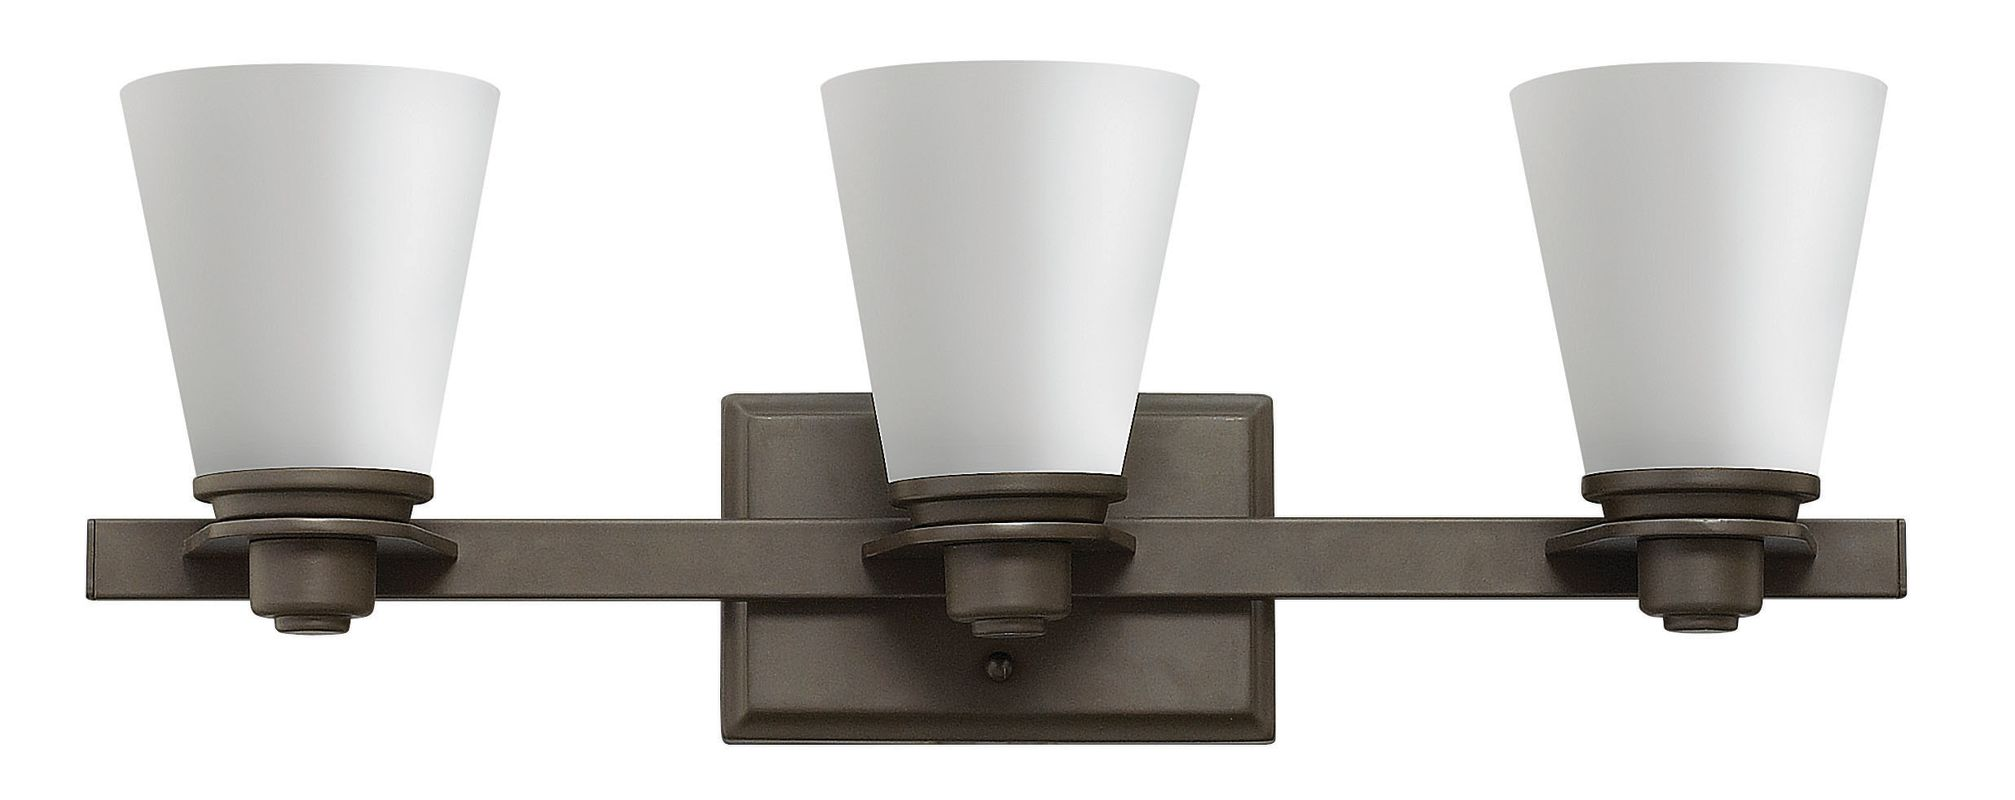 Hinkley Lighting 5553-GU24 3 Light Title 24 Fluorescent Bathroom